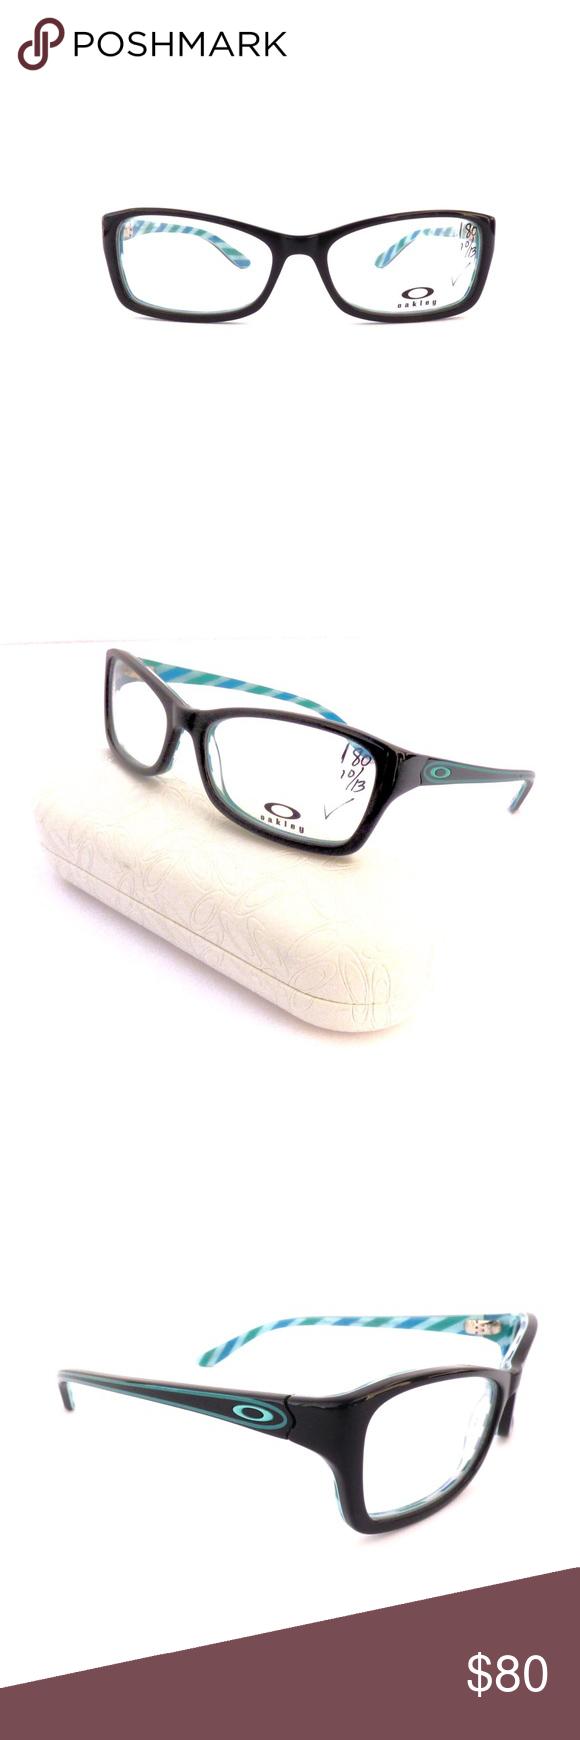 100% Authentic Oakley Black Cosmo Eyeglasses